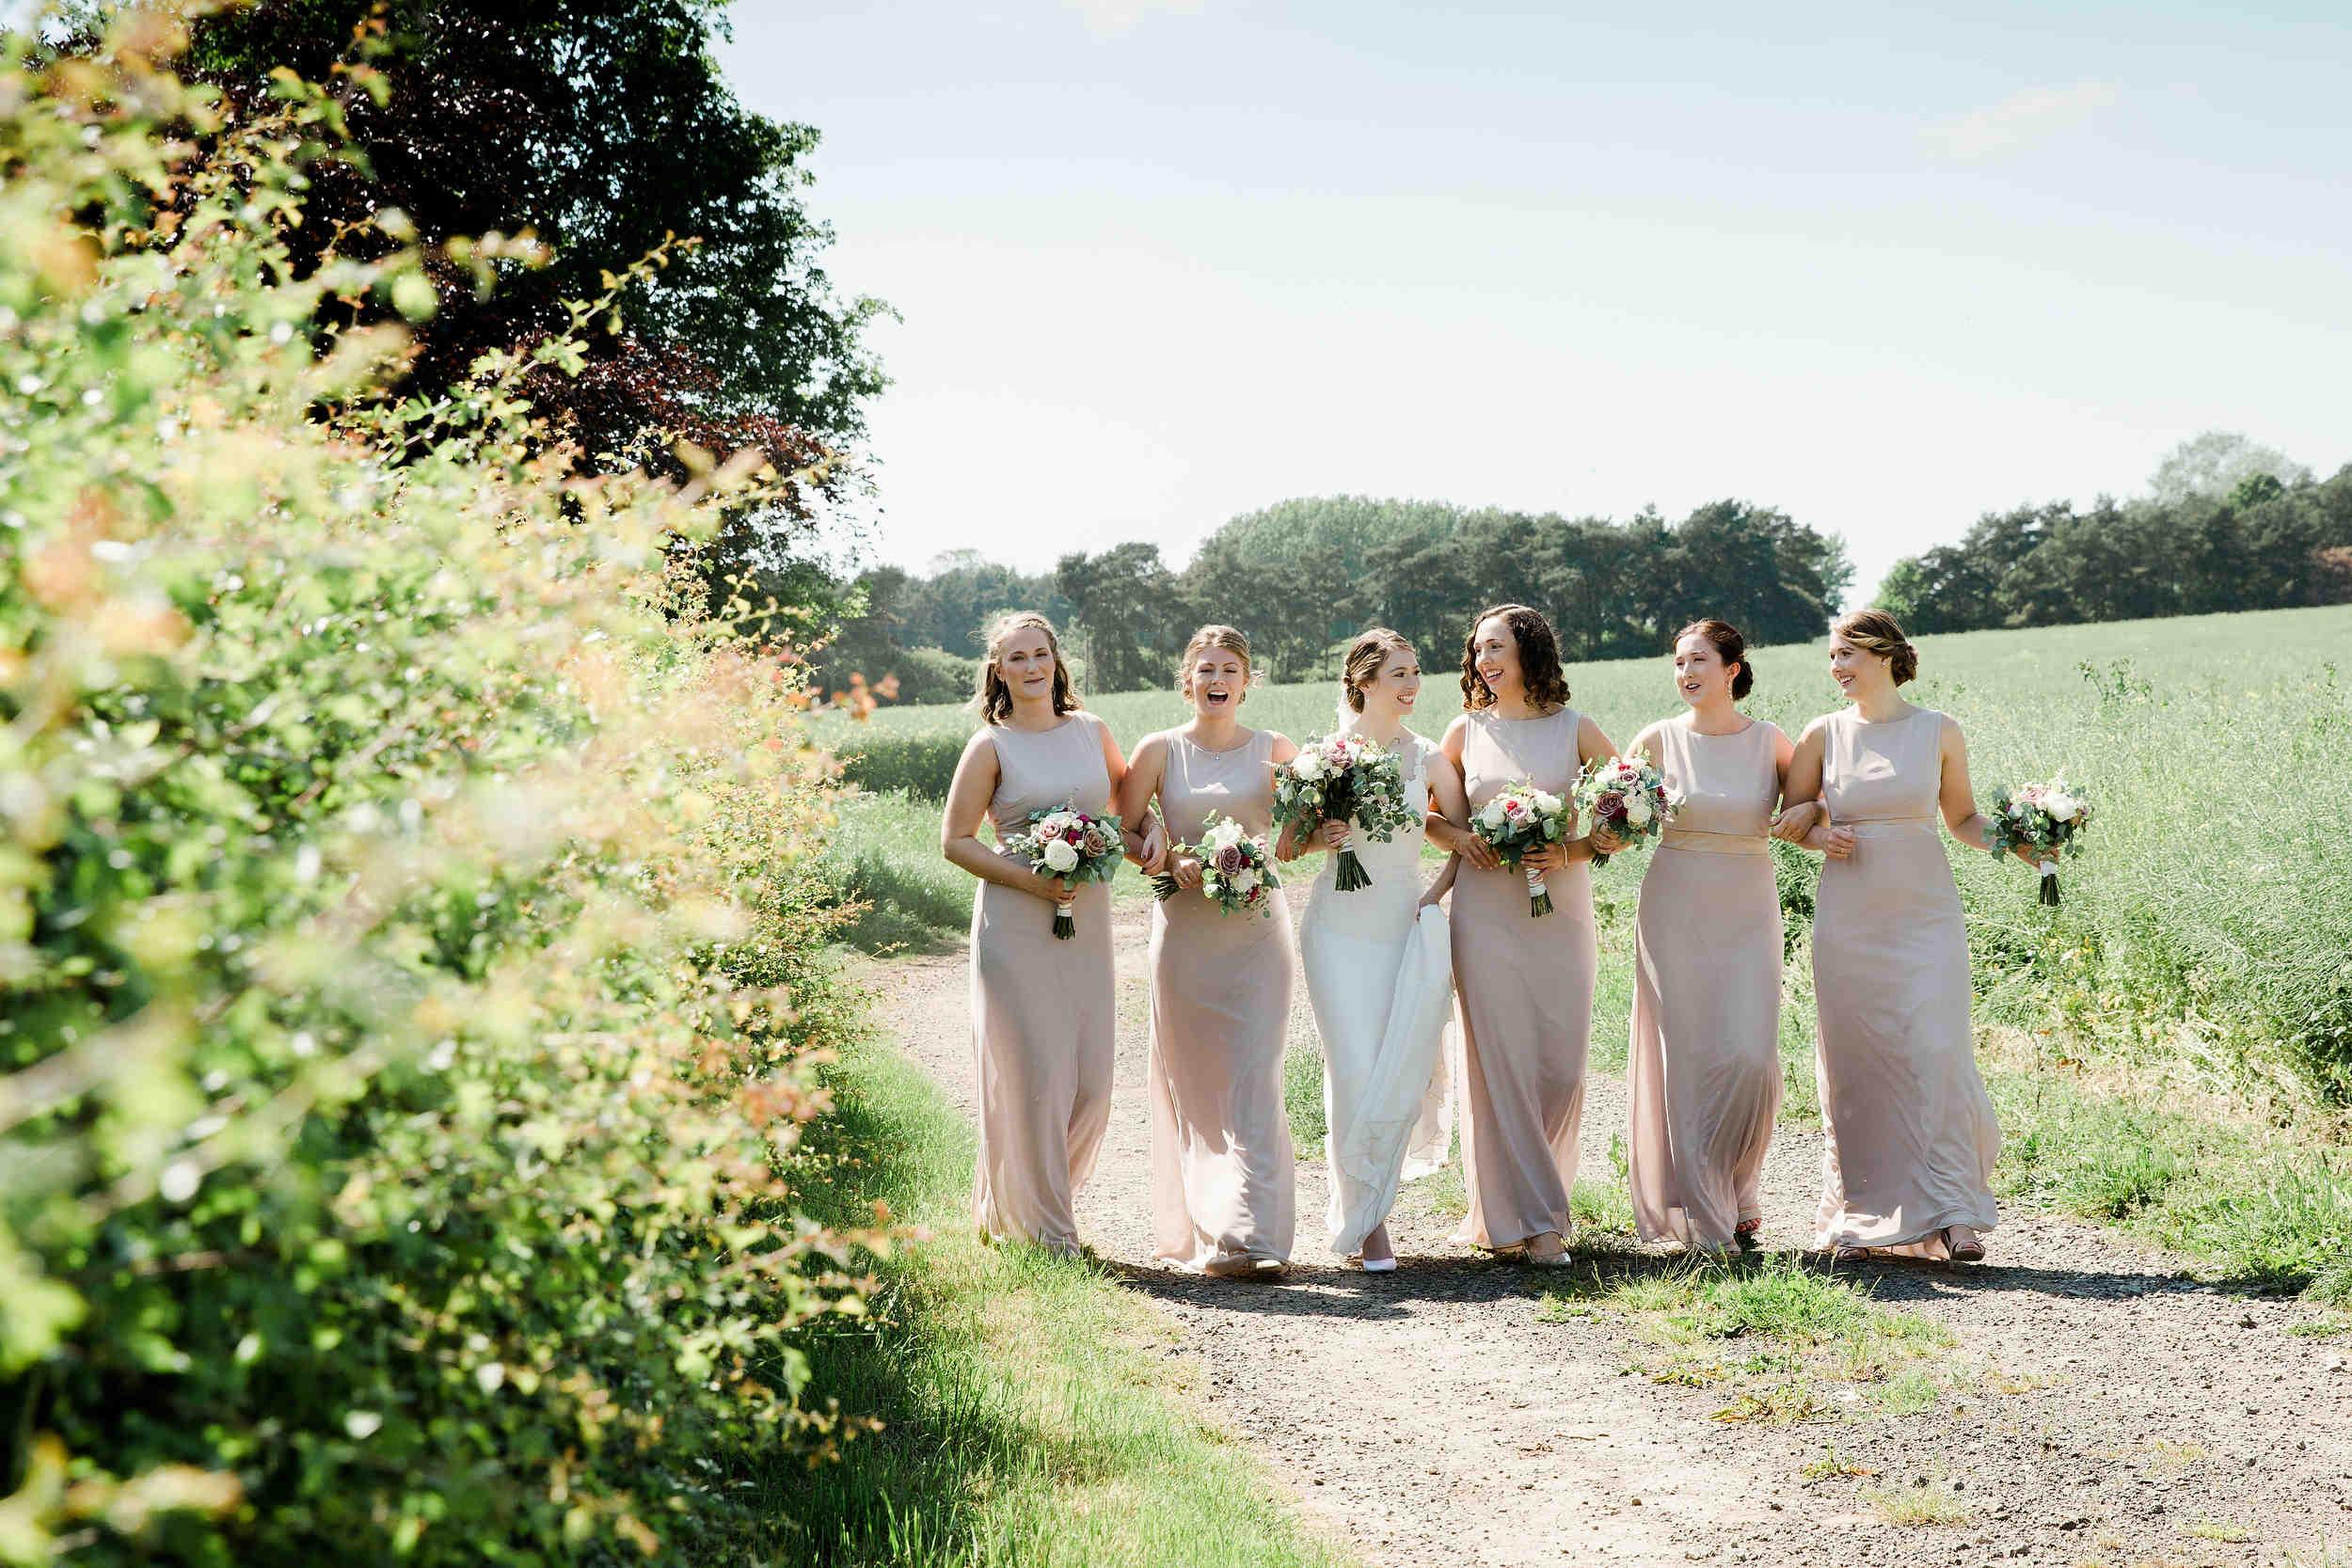 Modern_Stylish_Wedding_at_Swallows_Nest_Barn1218